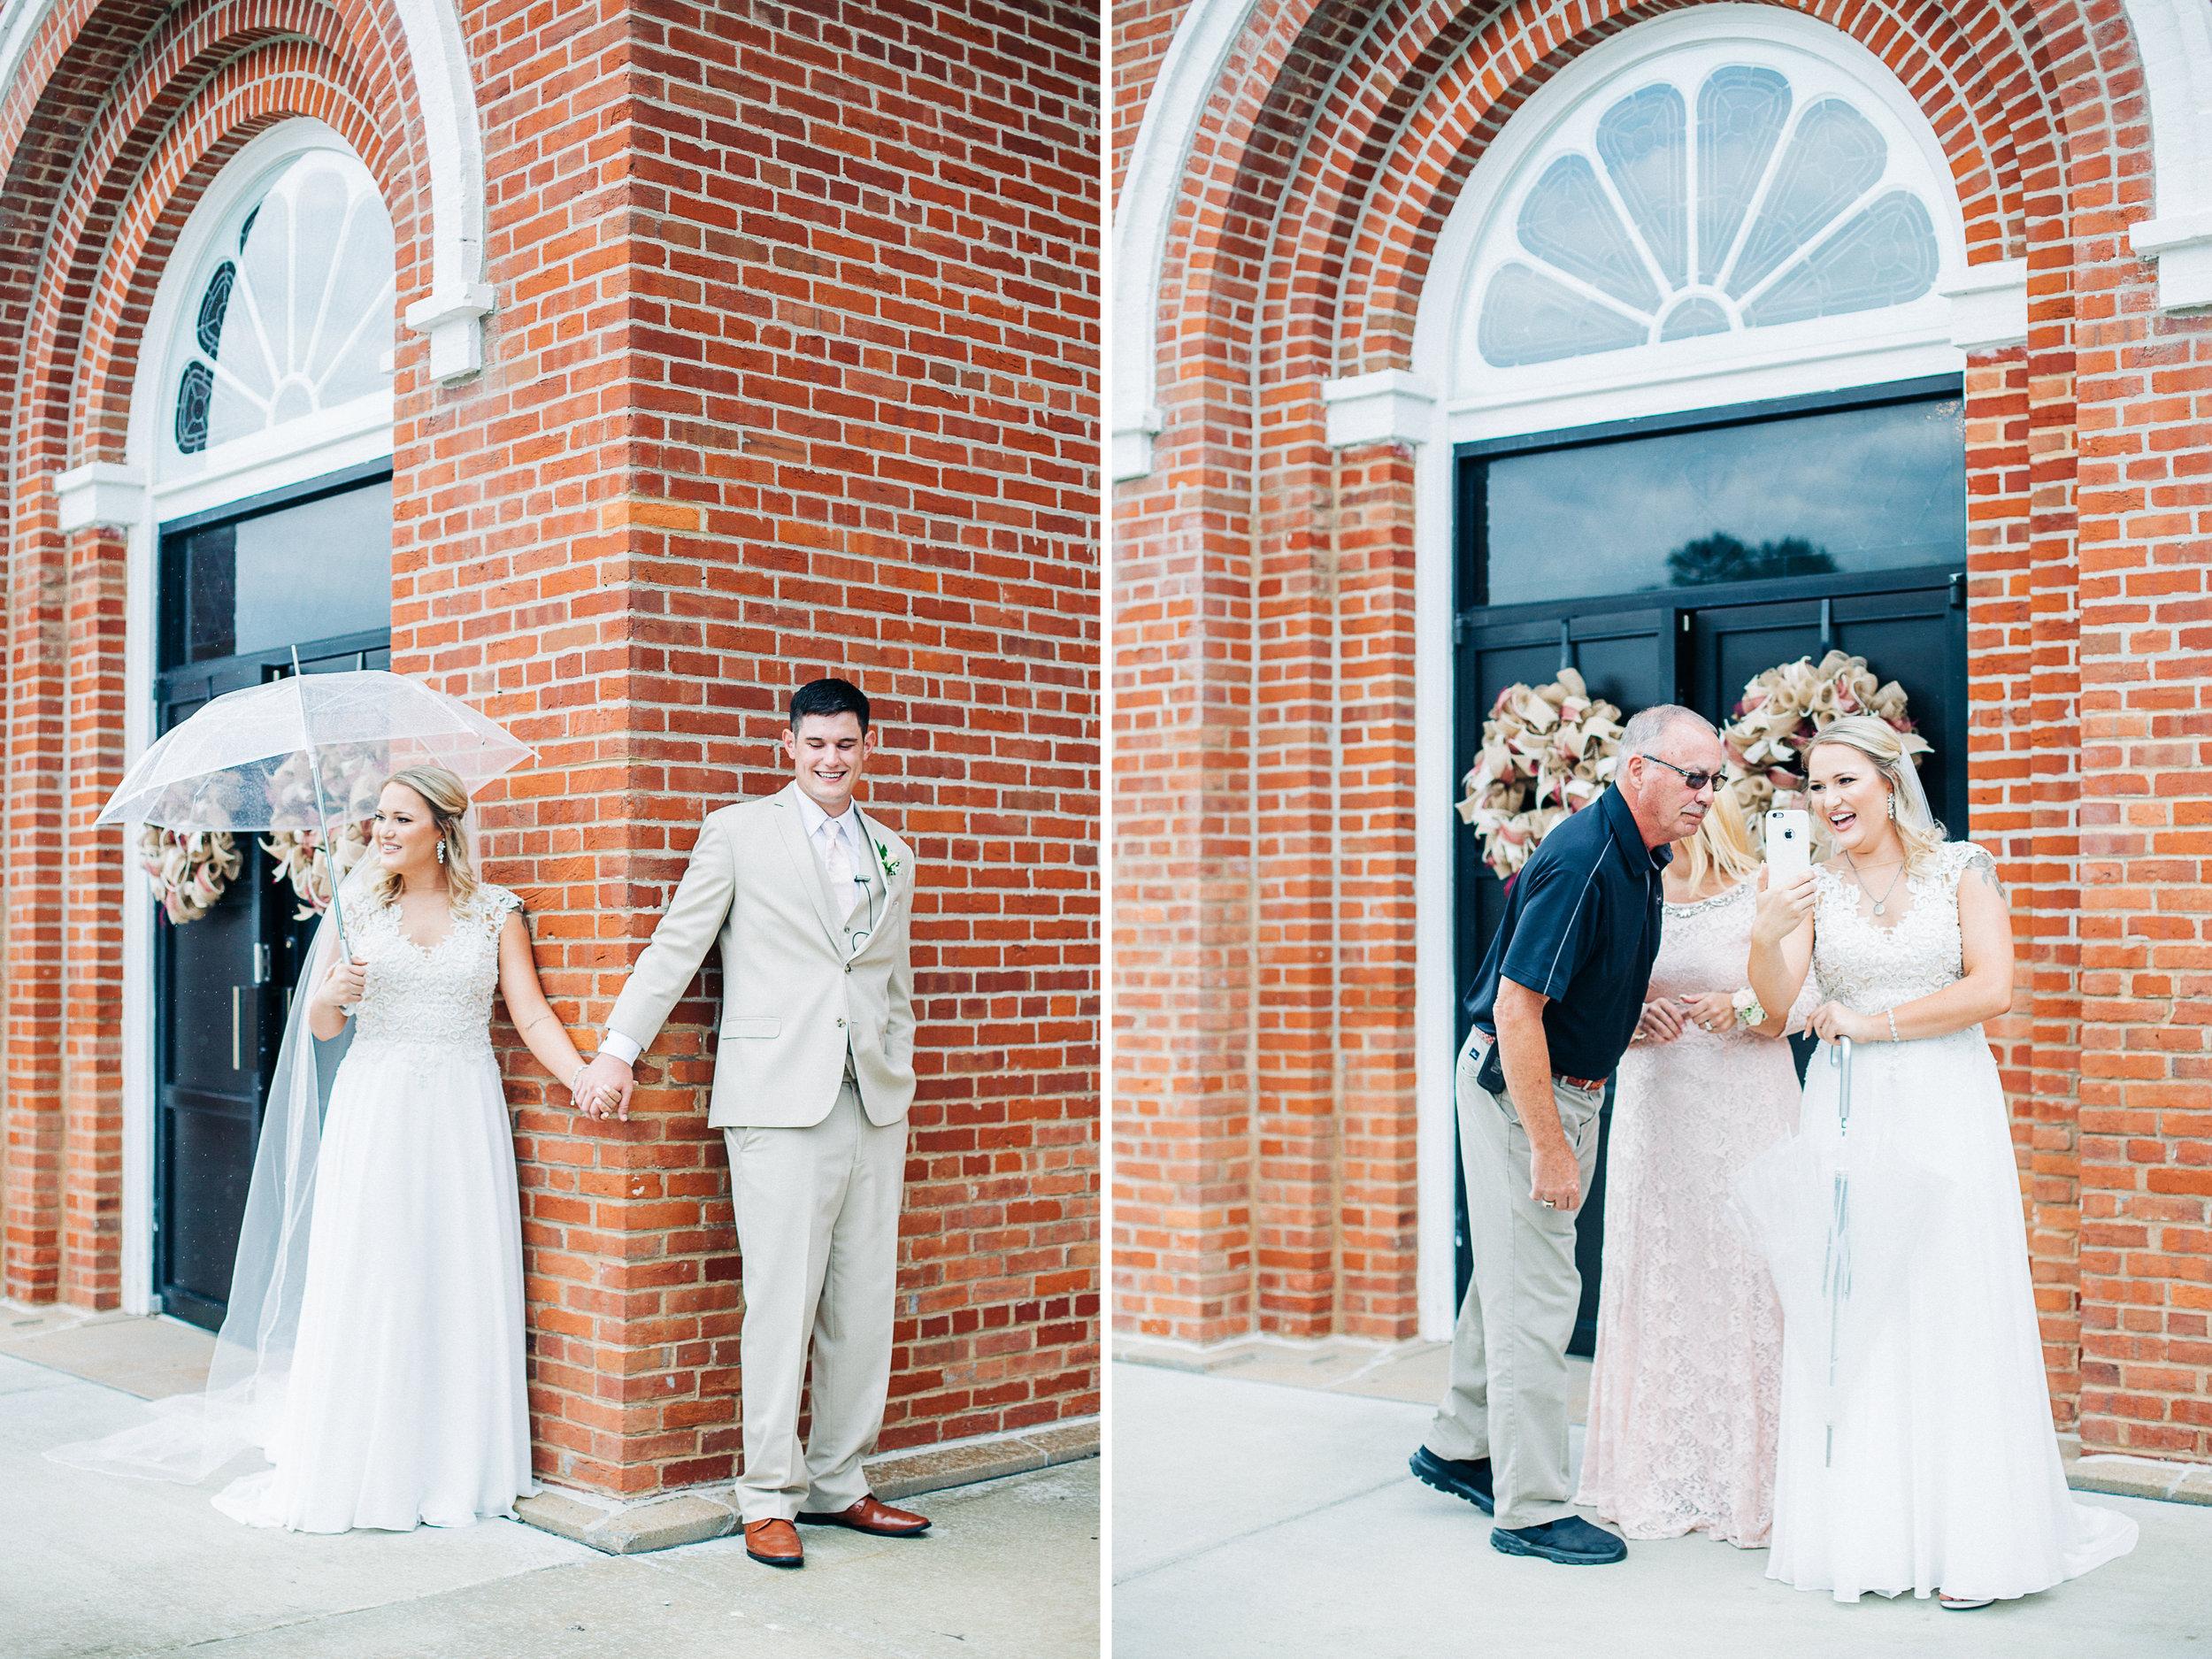 Dorothy_Louise_Photography_Marissa_Jake_Wentzville_MO_Wedding2.jpg